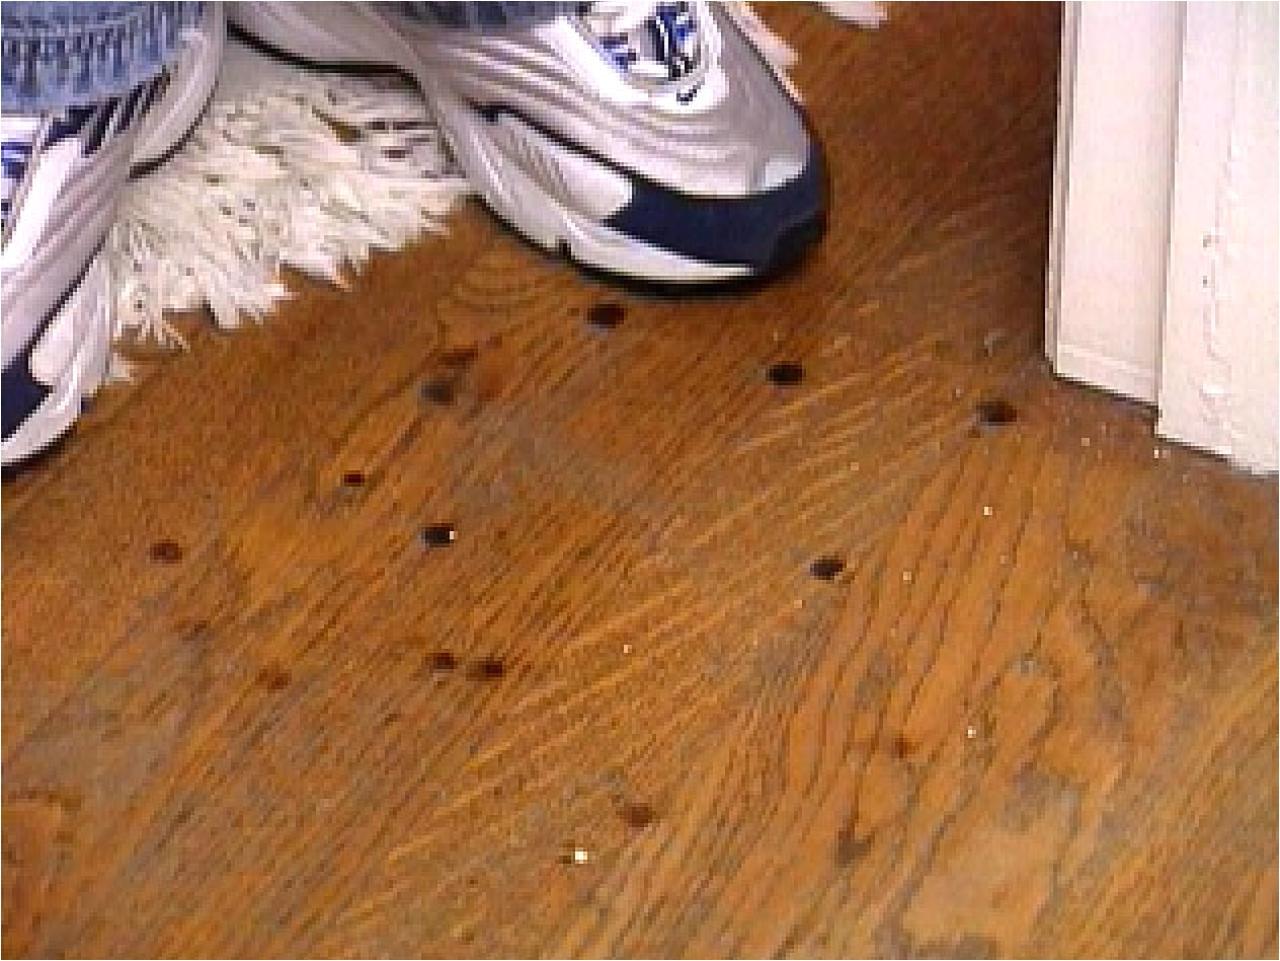 Removing Sticky Glue From Hardwood Floors How to Remove Burn Marks On A Hardwood Floor Hgtv